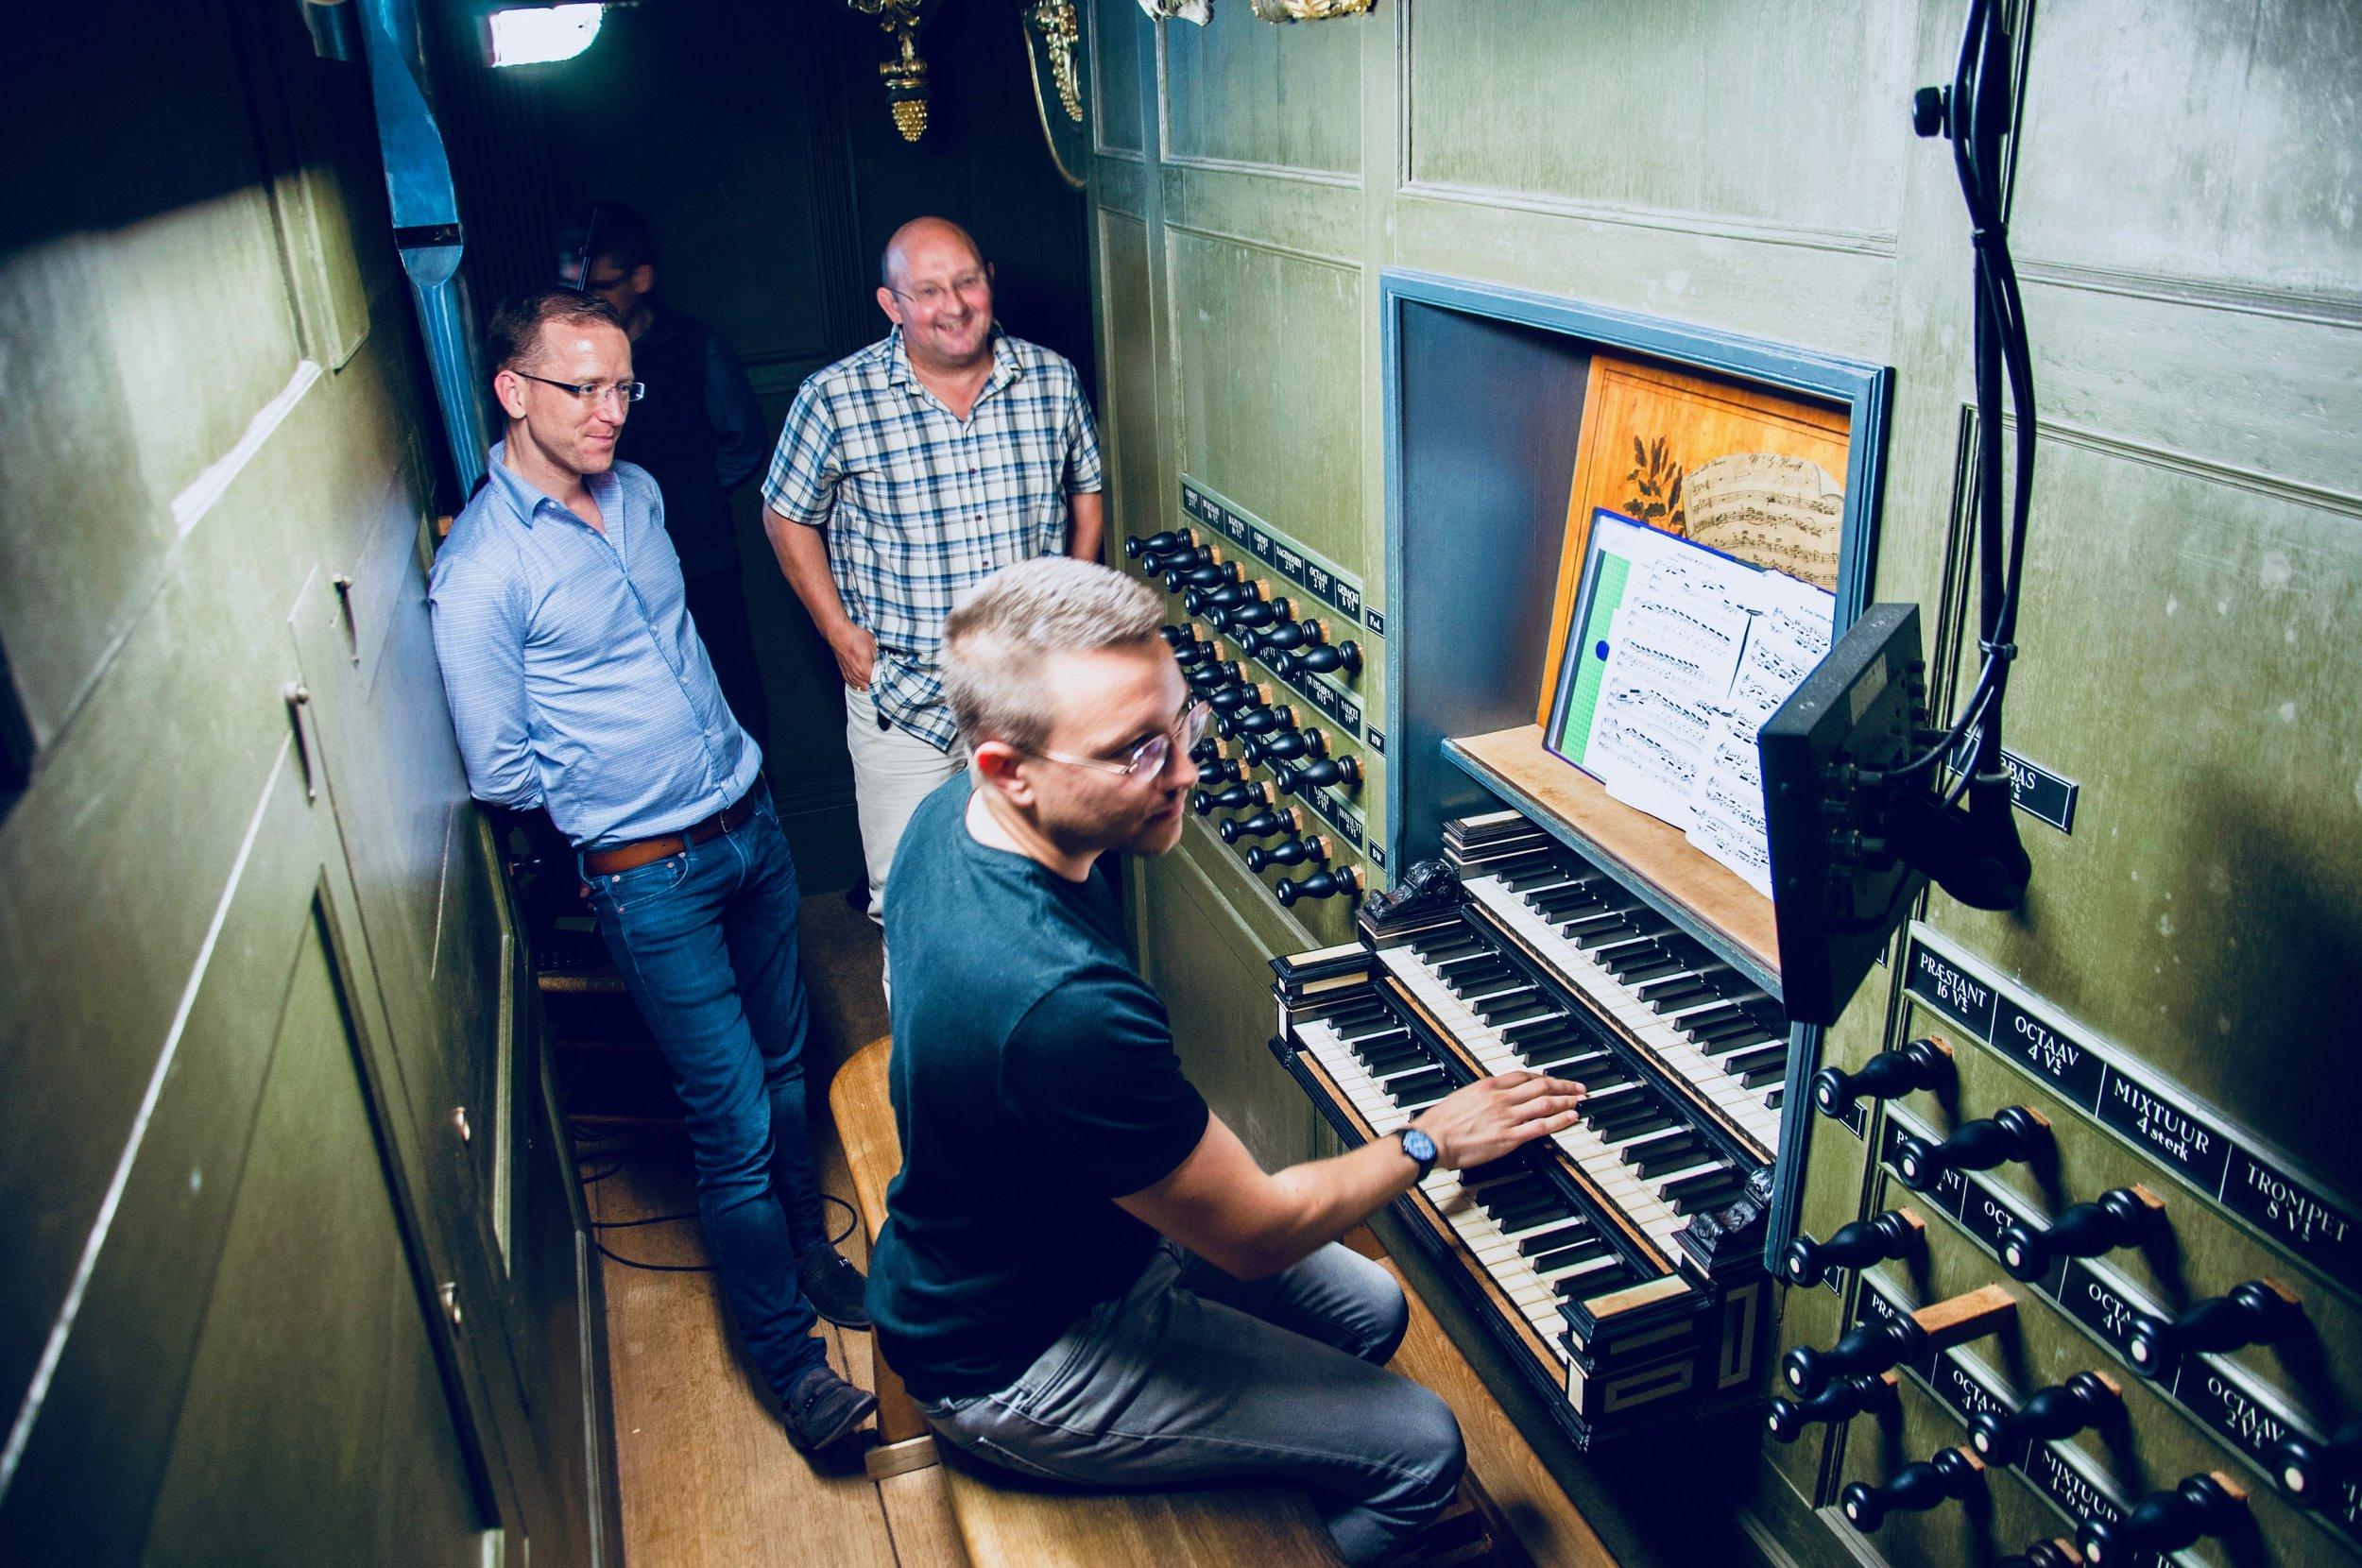 Corey De Tars plays 1692 Arp Schnitger pipe organ, Martinikerk, Groningen, with Christian Lane and Erwin Wiersinga looking on.